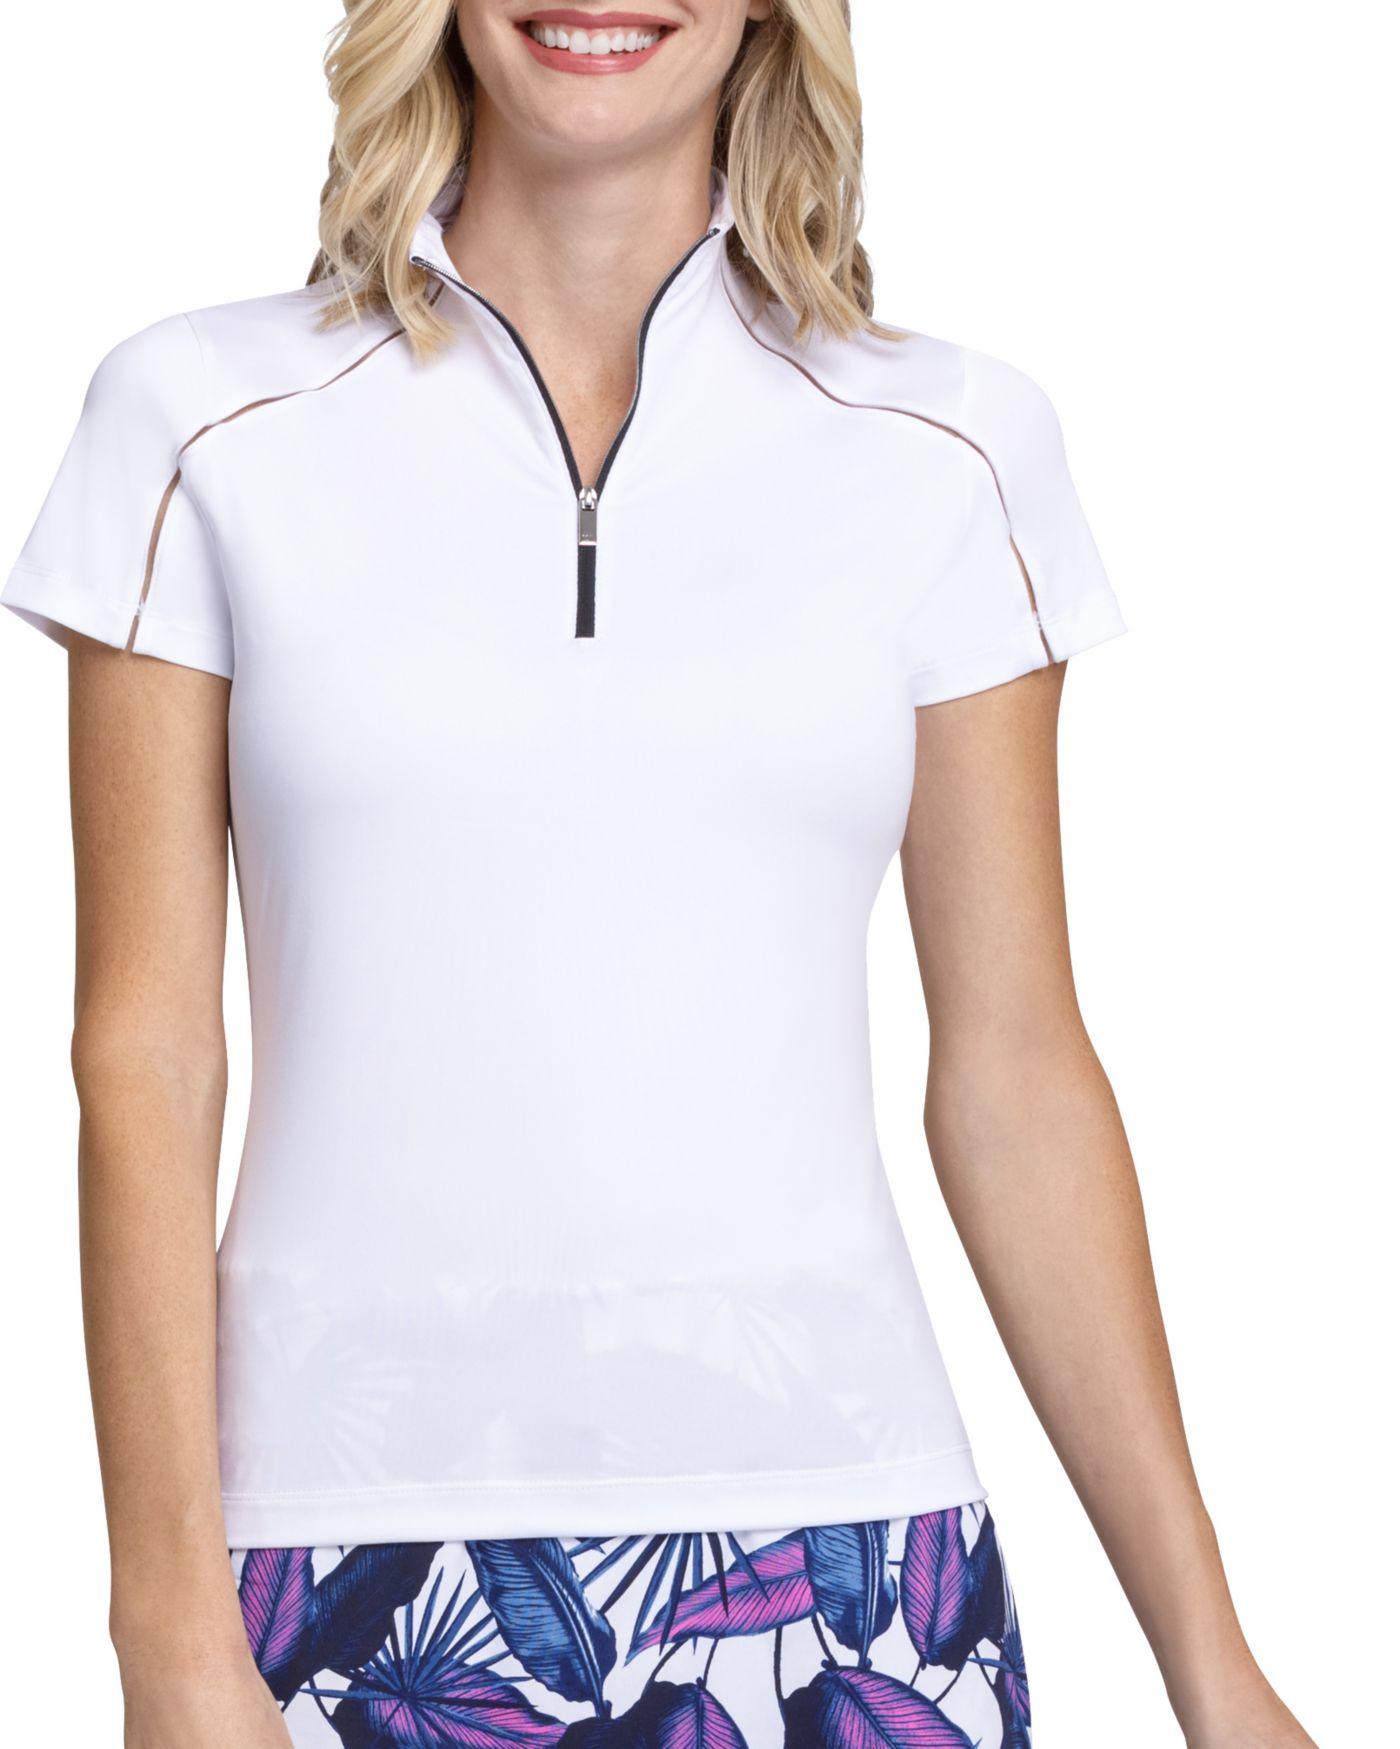 Tail Women's Funnel Neck Short Sleeve Golf Polo